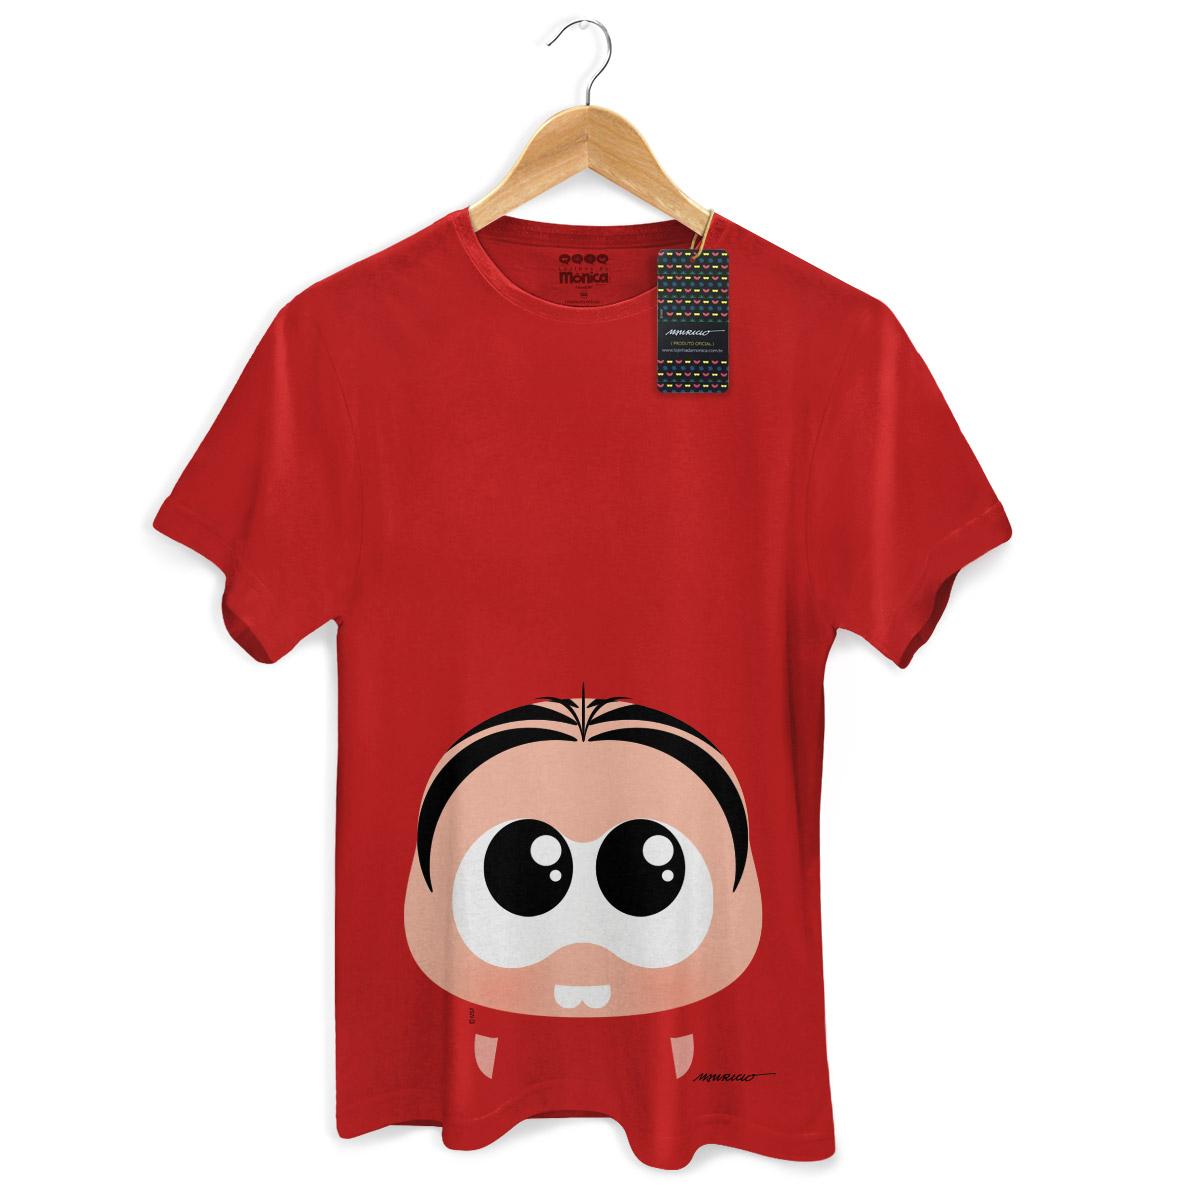 Camiseta Masculina Turma da M�nica Toy Big M�nica